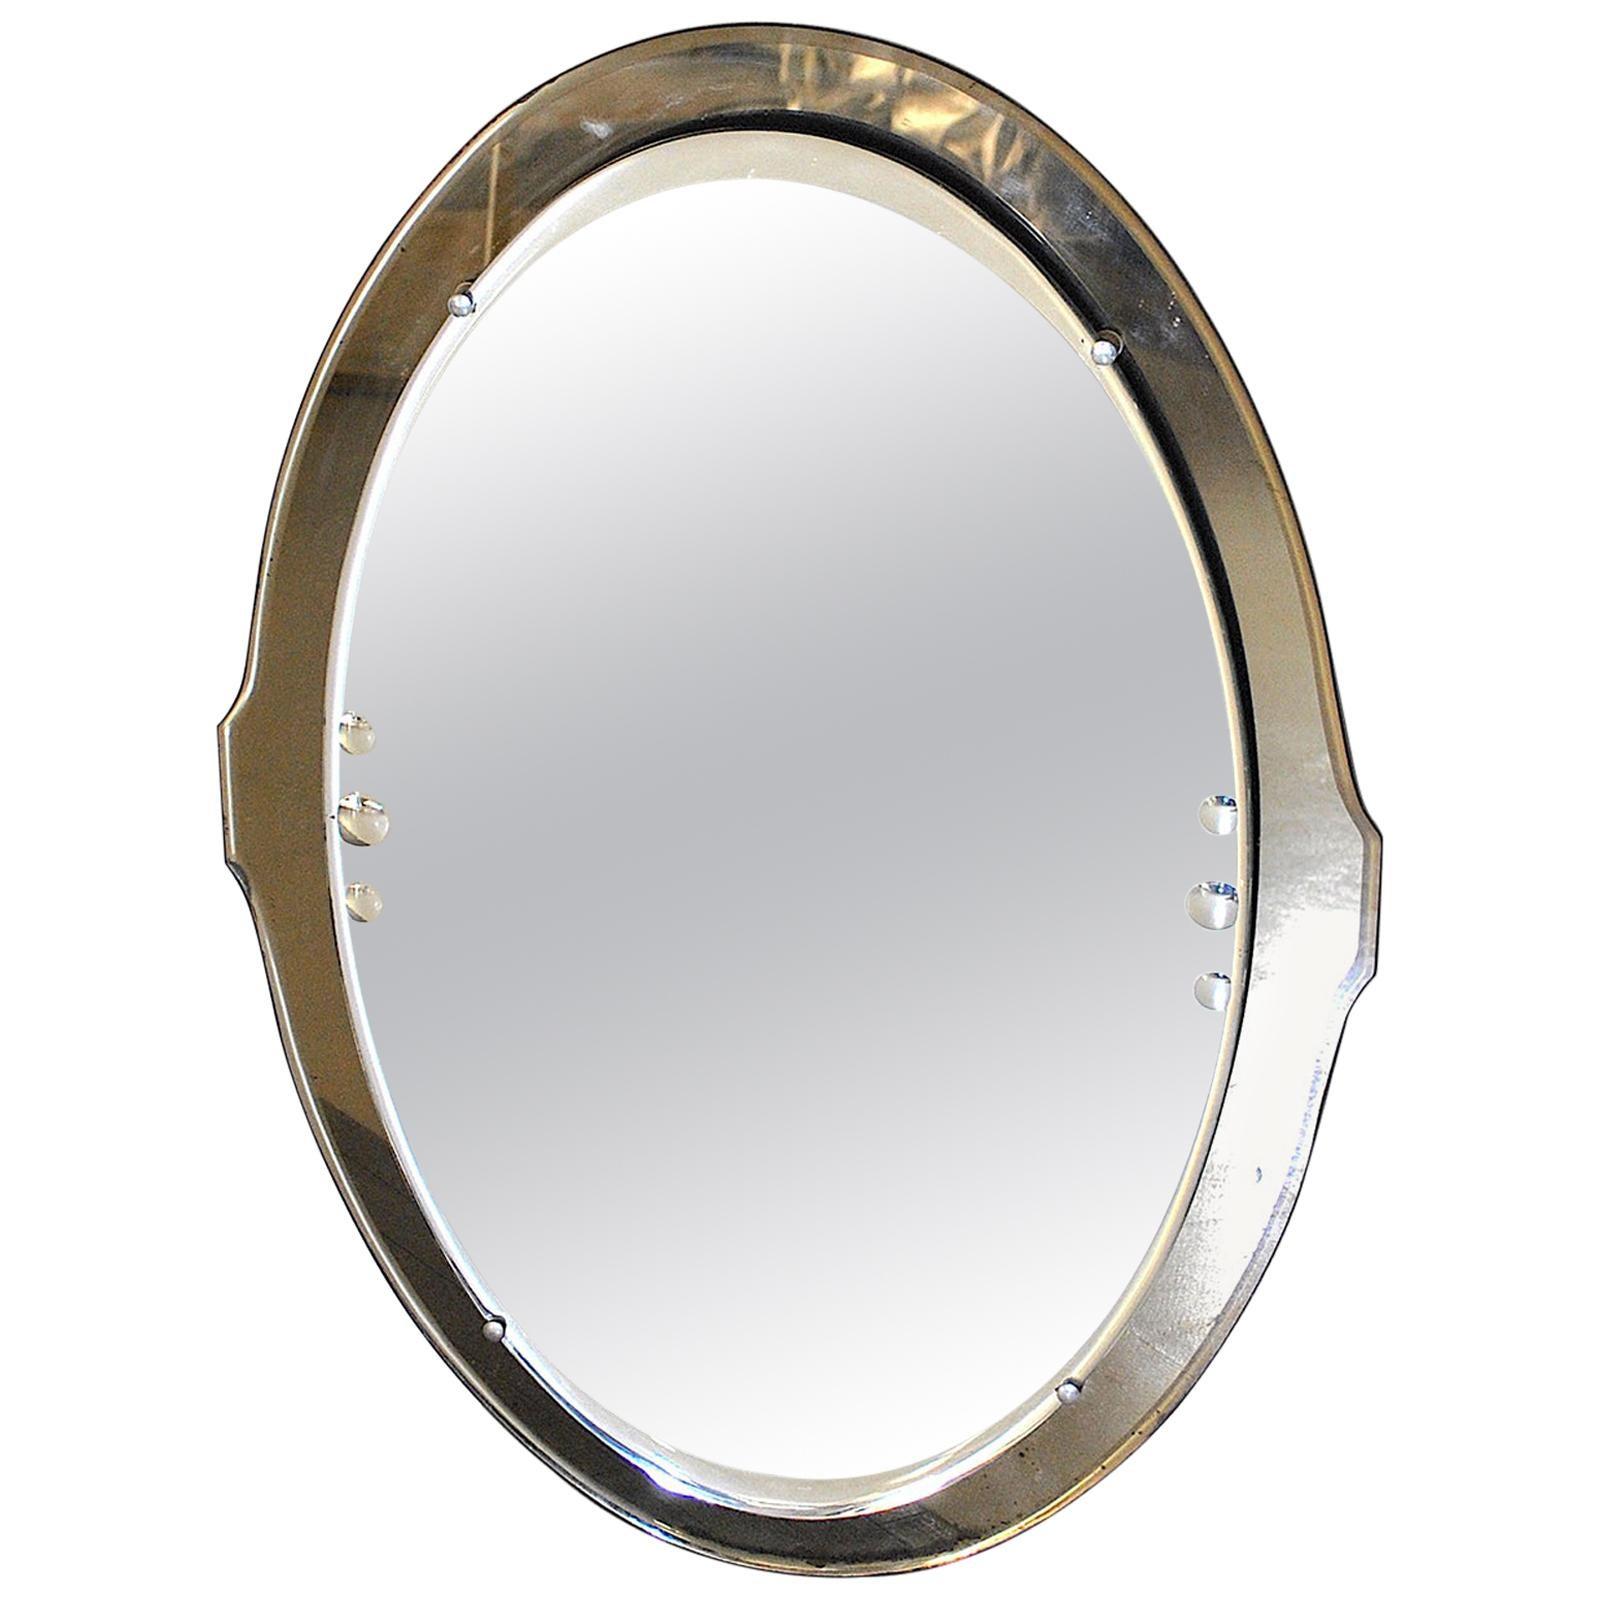 Cristal Art Oval Mirror 50s